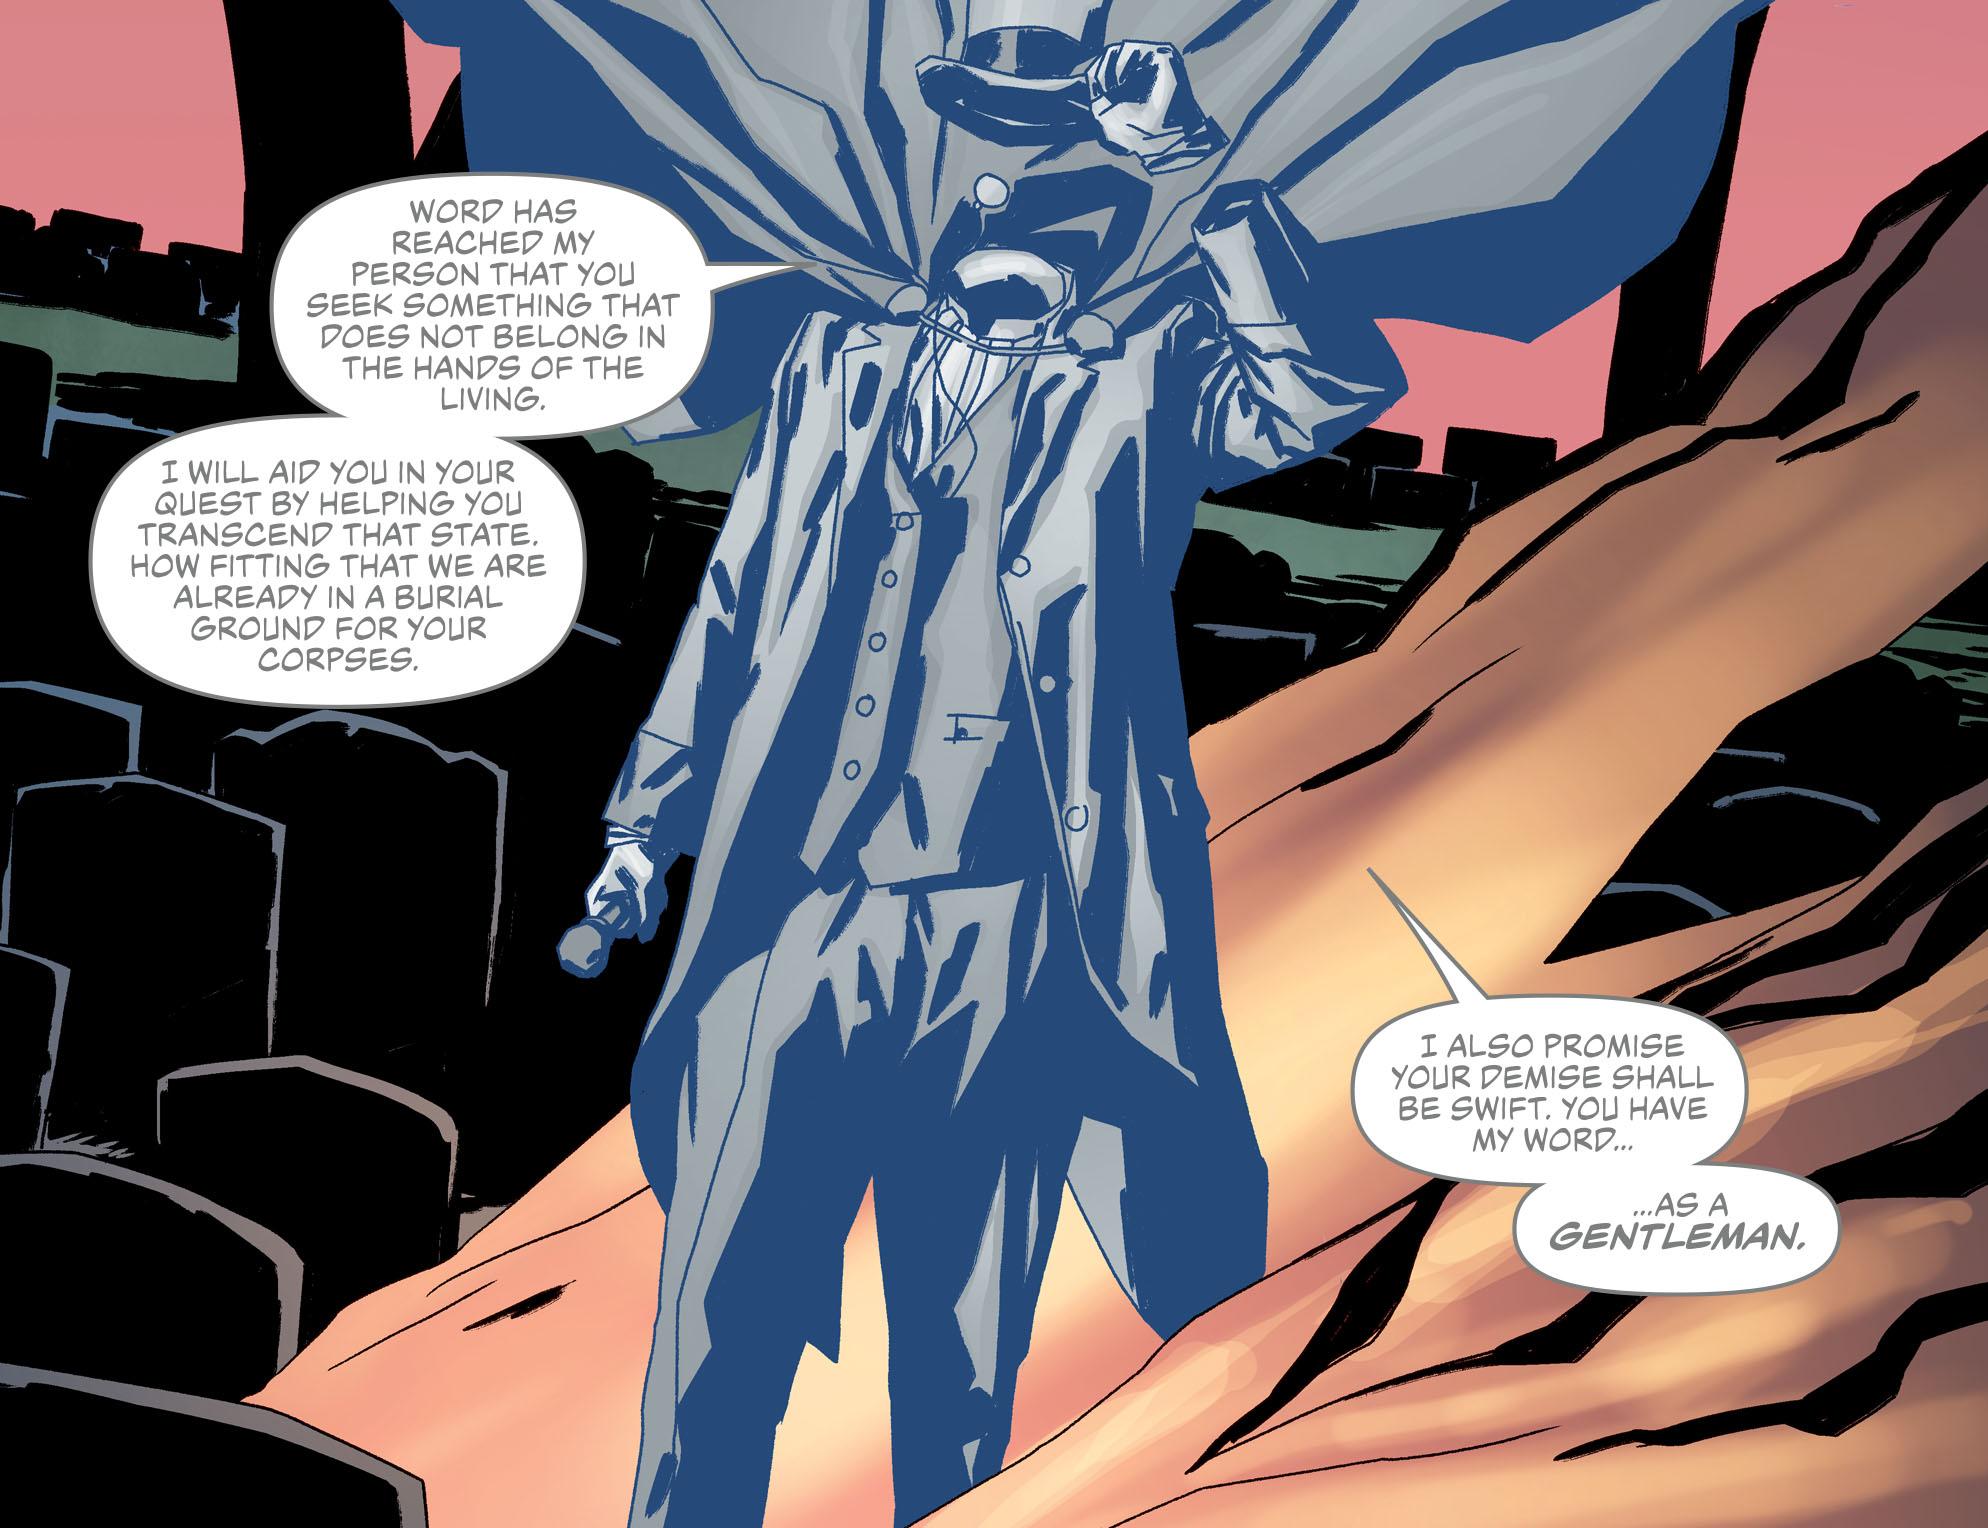 James Craddock (DC Animated Movie Universe)